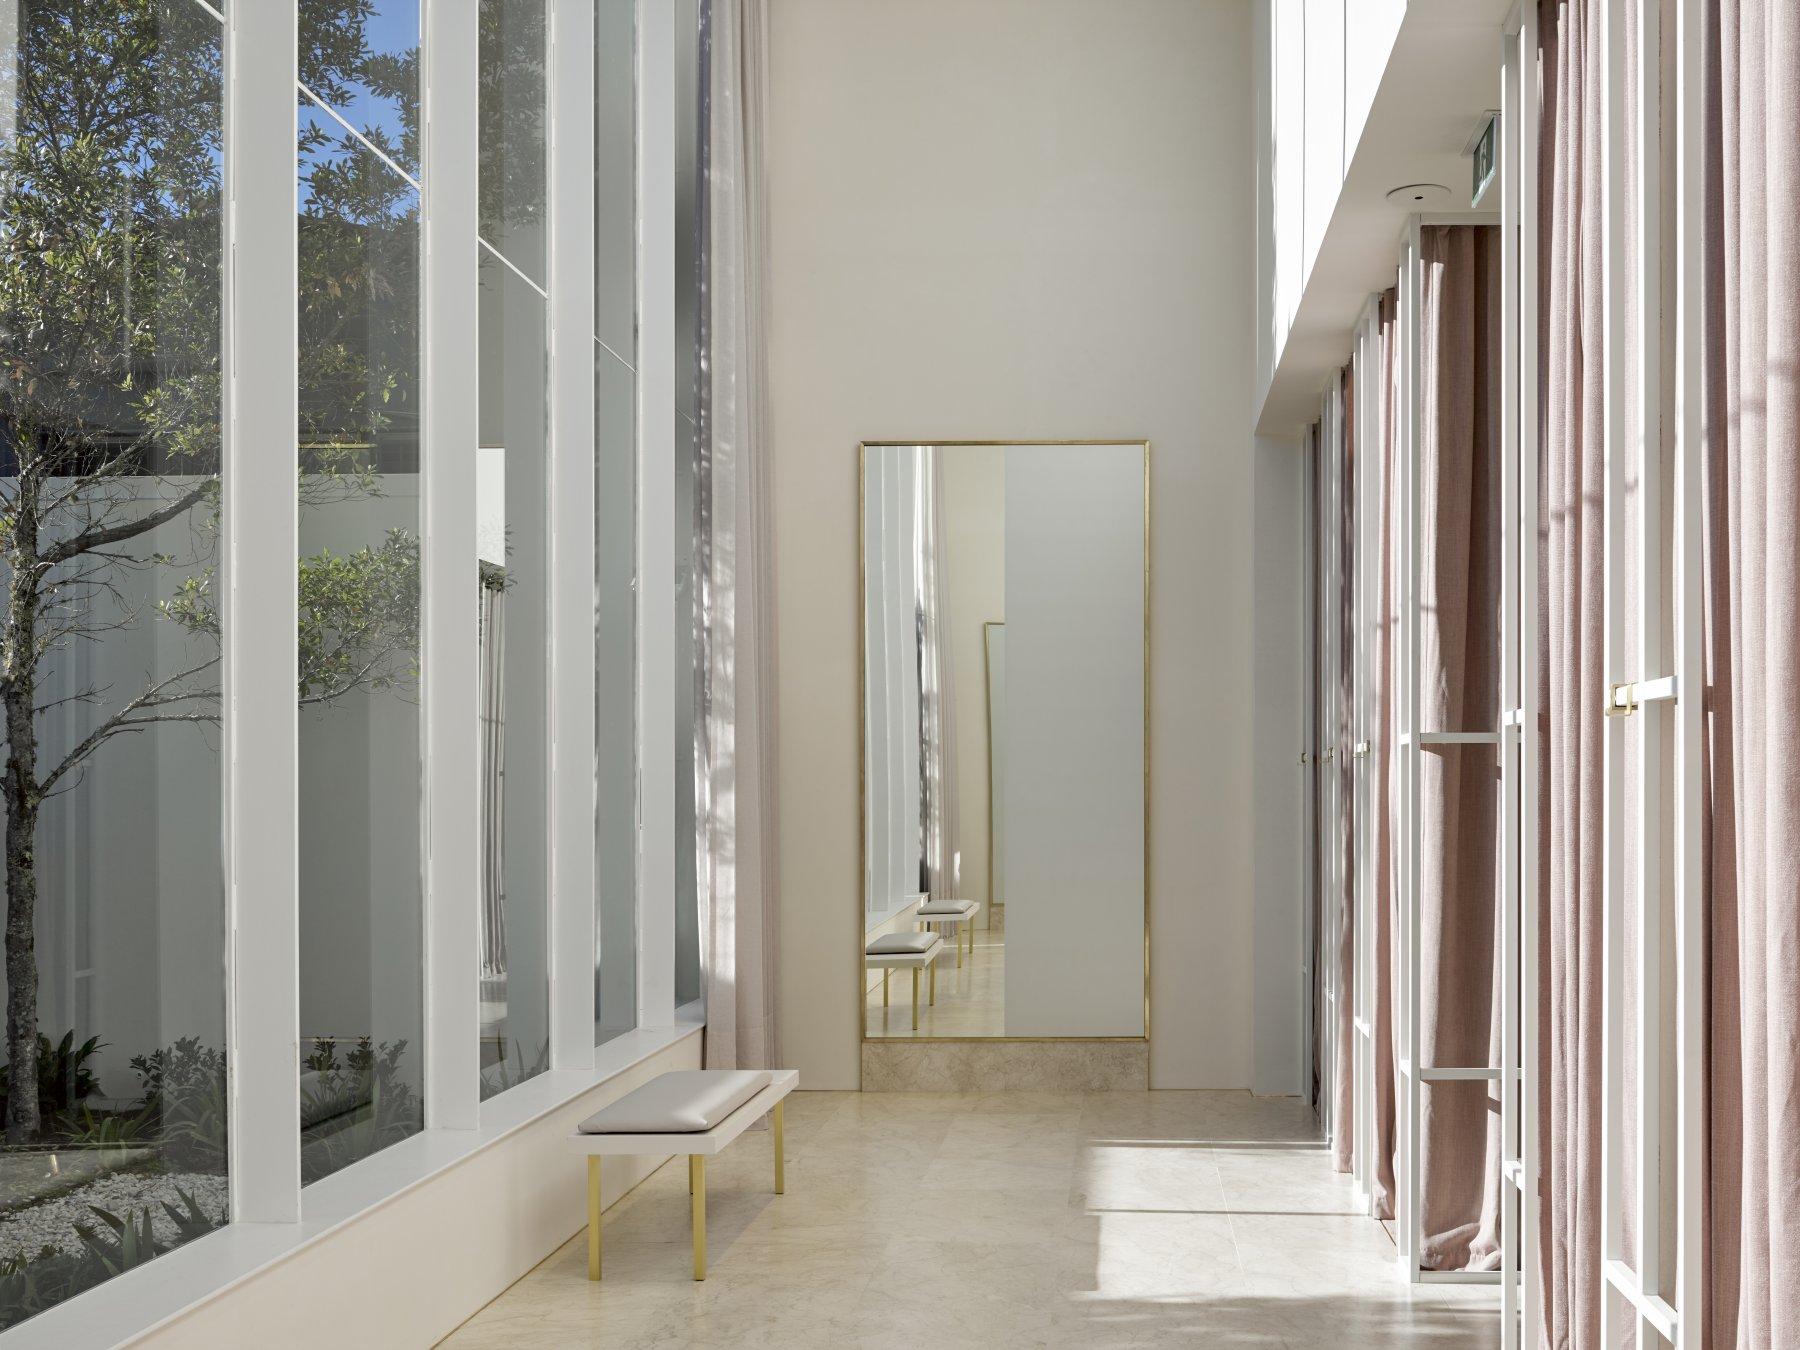 Cavill Architects, Commercial Architects Brisbane, Kookaï James Street, Brisbane Architecture, Brisbane Architects